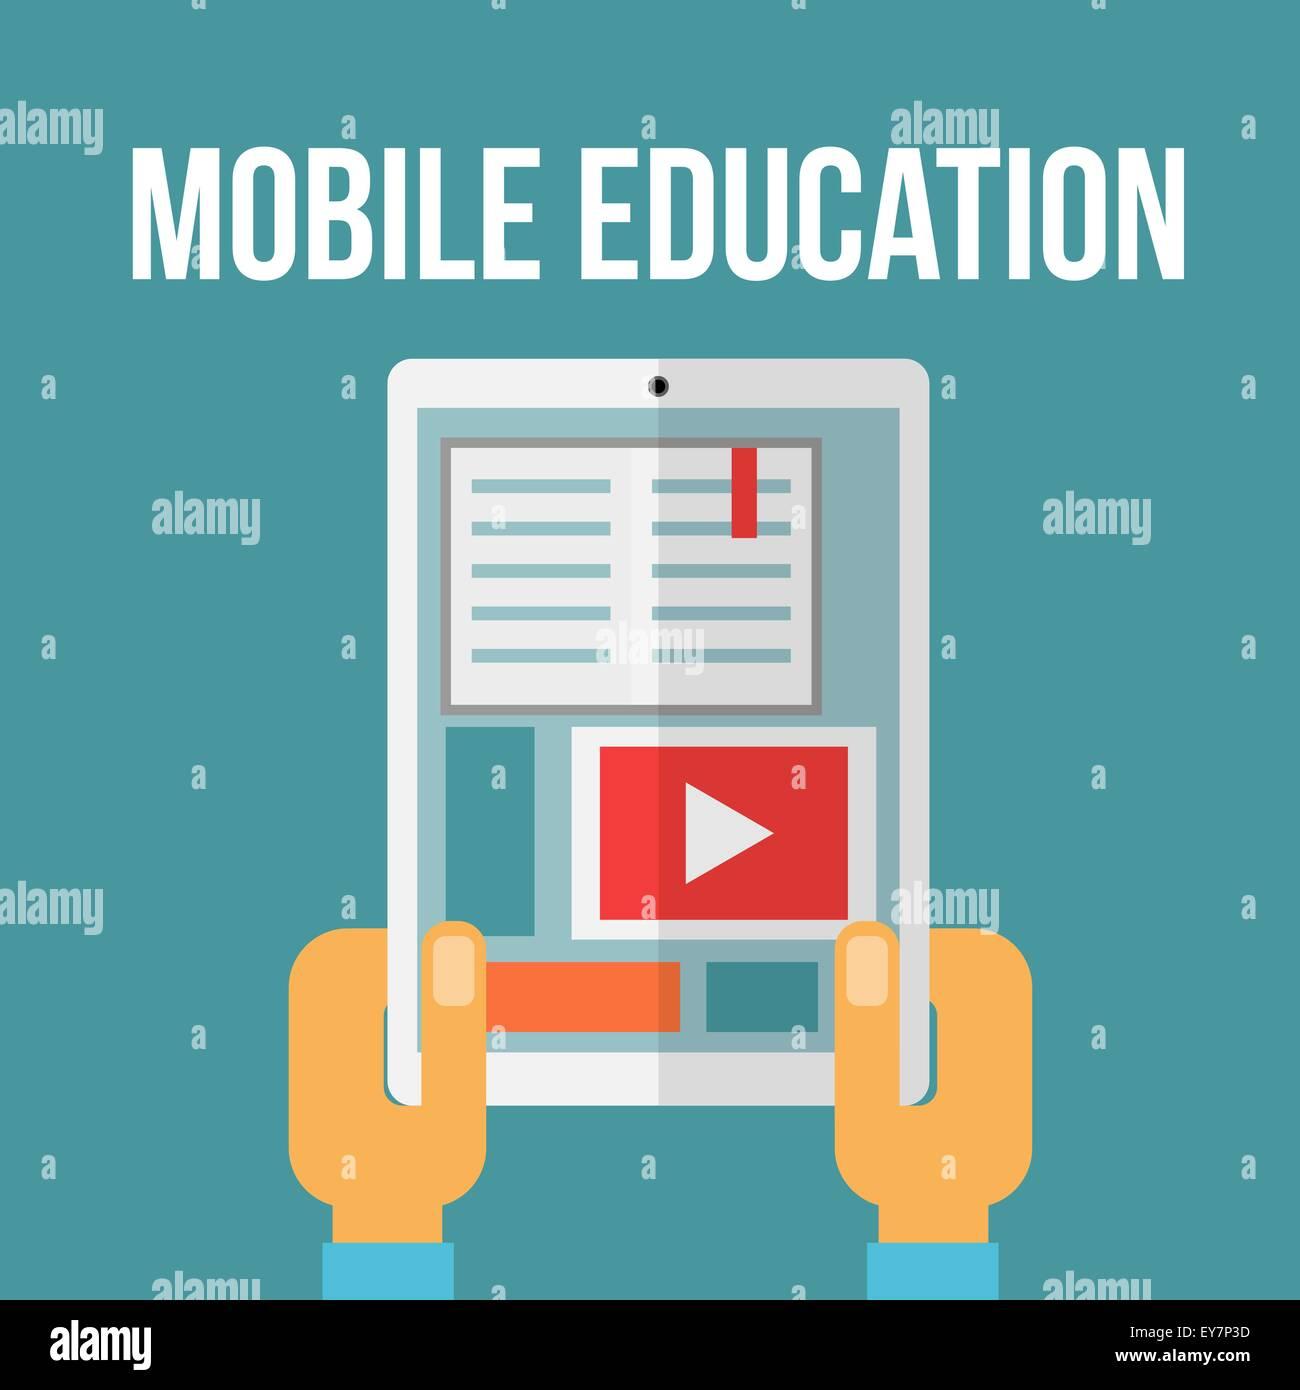 Mobile education concept. Vector illustration - Stock Vector